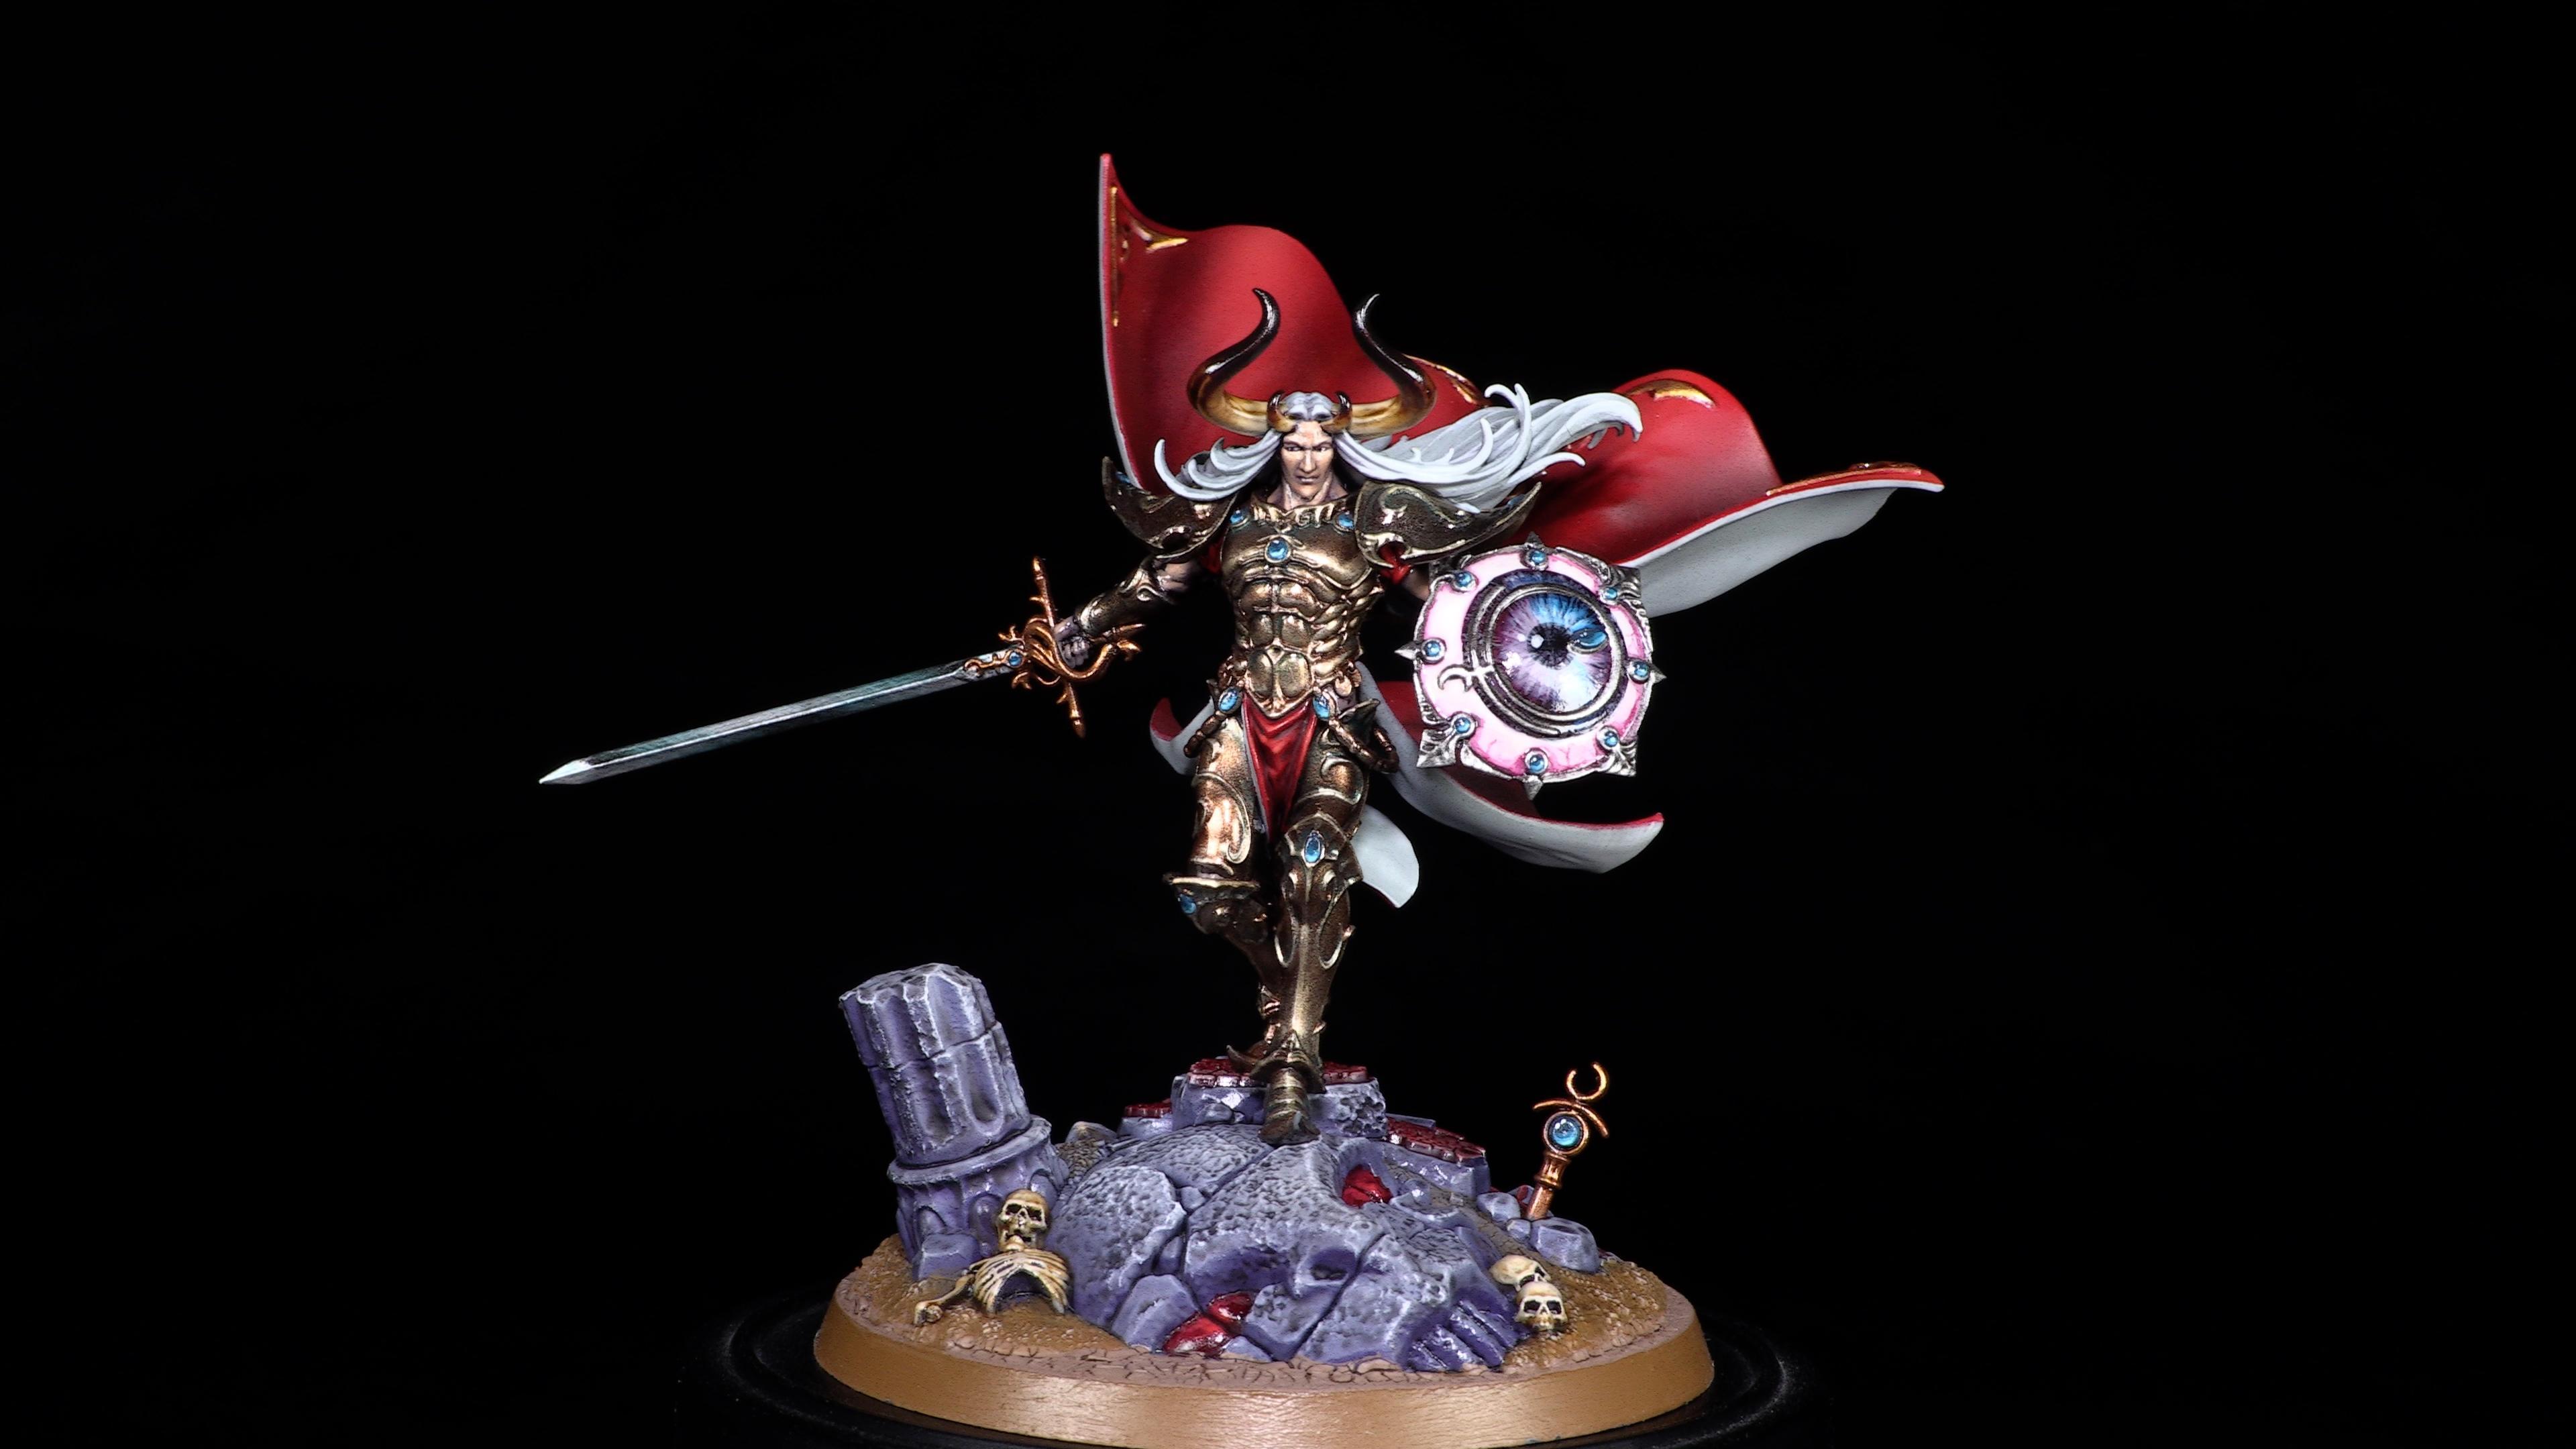 Age Of Sigmar, Hedonites Of Slaanesh, Prince Of Slaanesh, Sigvald, Warhammer Fantasy